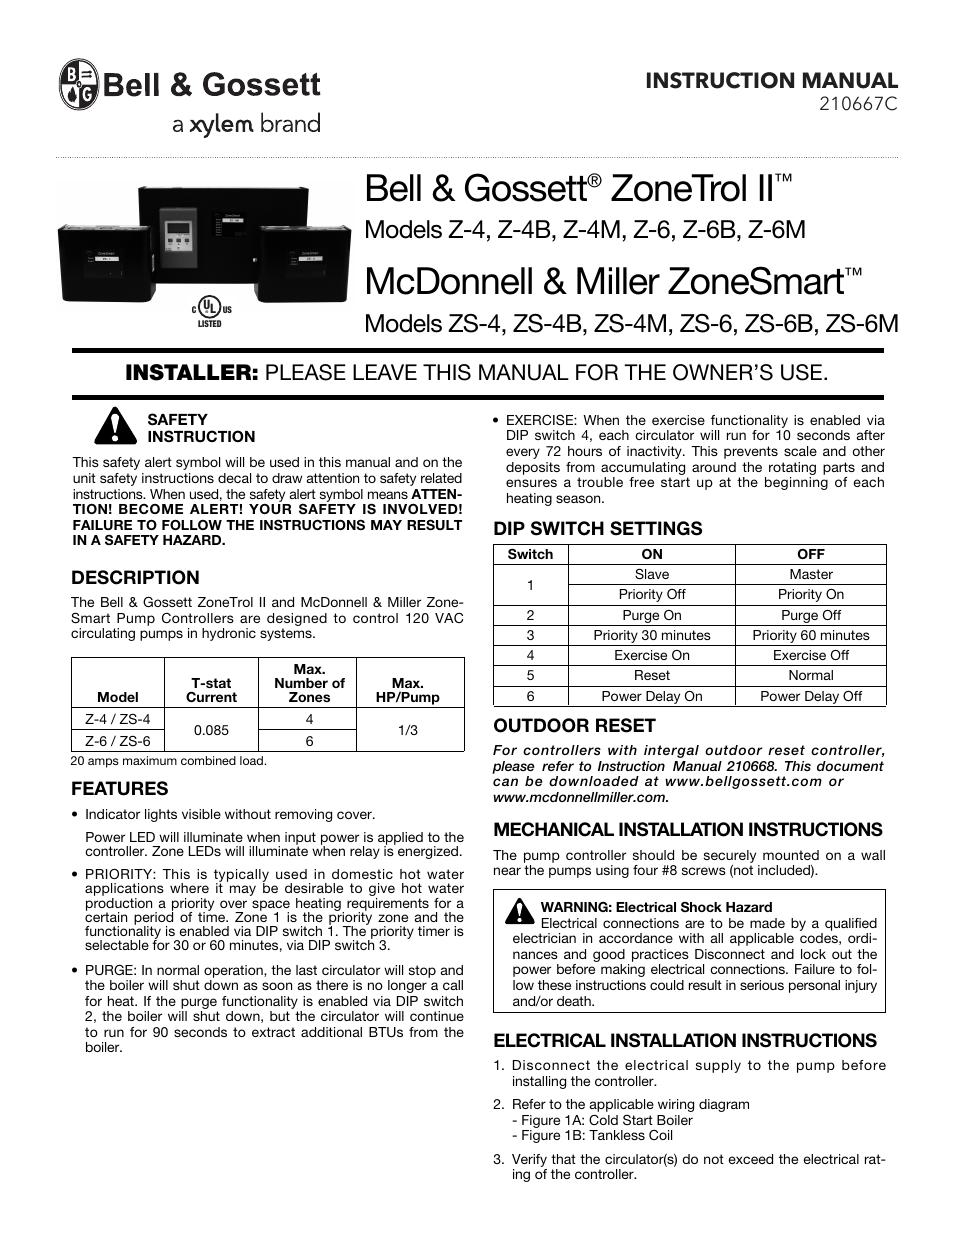 bell gossett 210667c z 6b user manual 2 pages also for rh manualsdir com Doorbell Transformer Wiring Diagram Doorbell Wiring Schematic Diagram